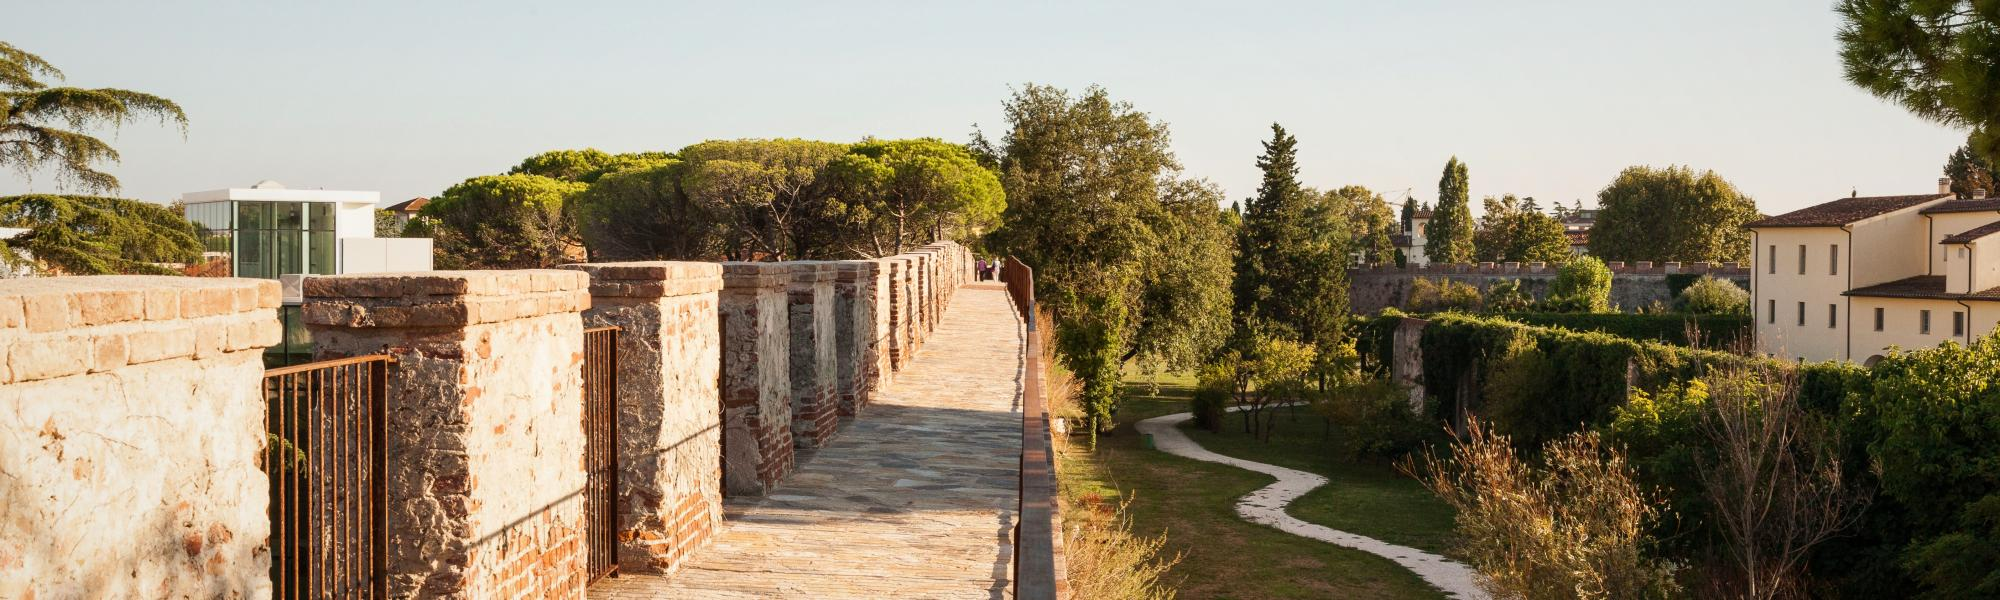 Camminamento sulle mura (da Mura di Pisa, www.muradipisa.it)